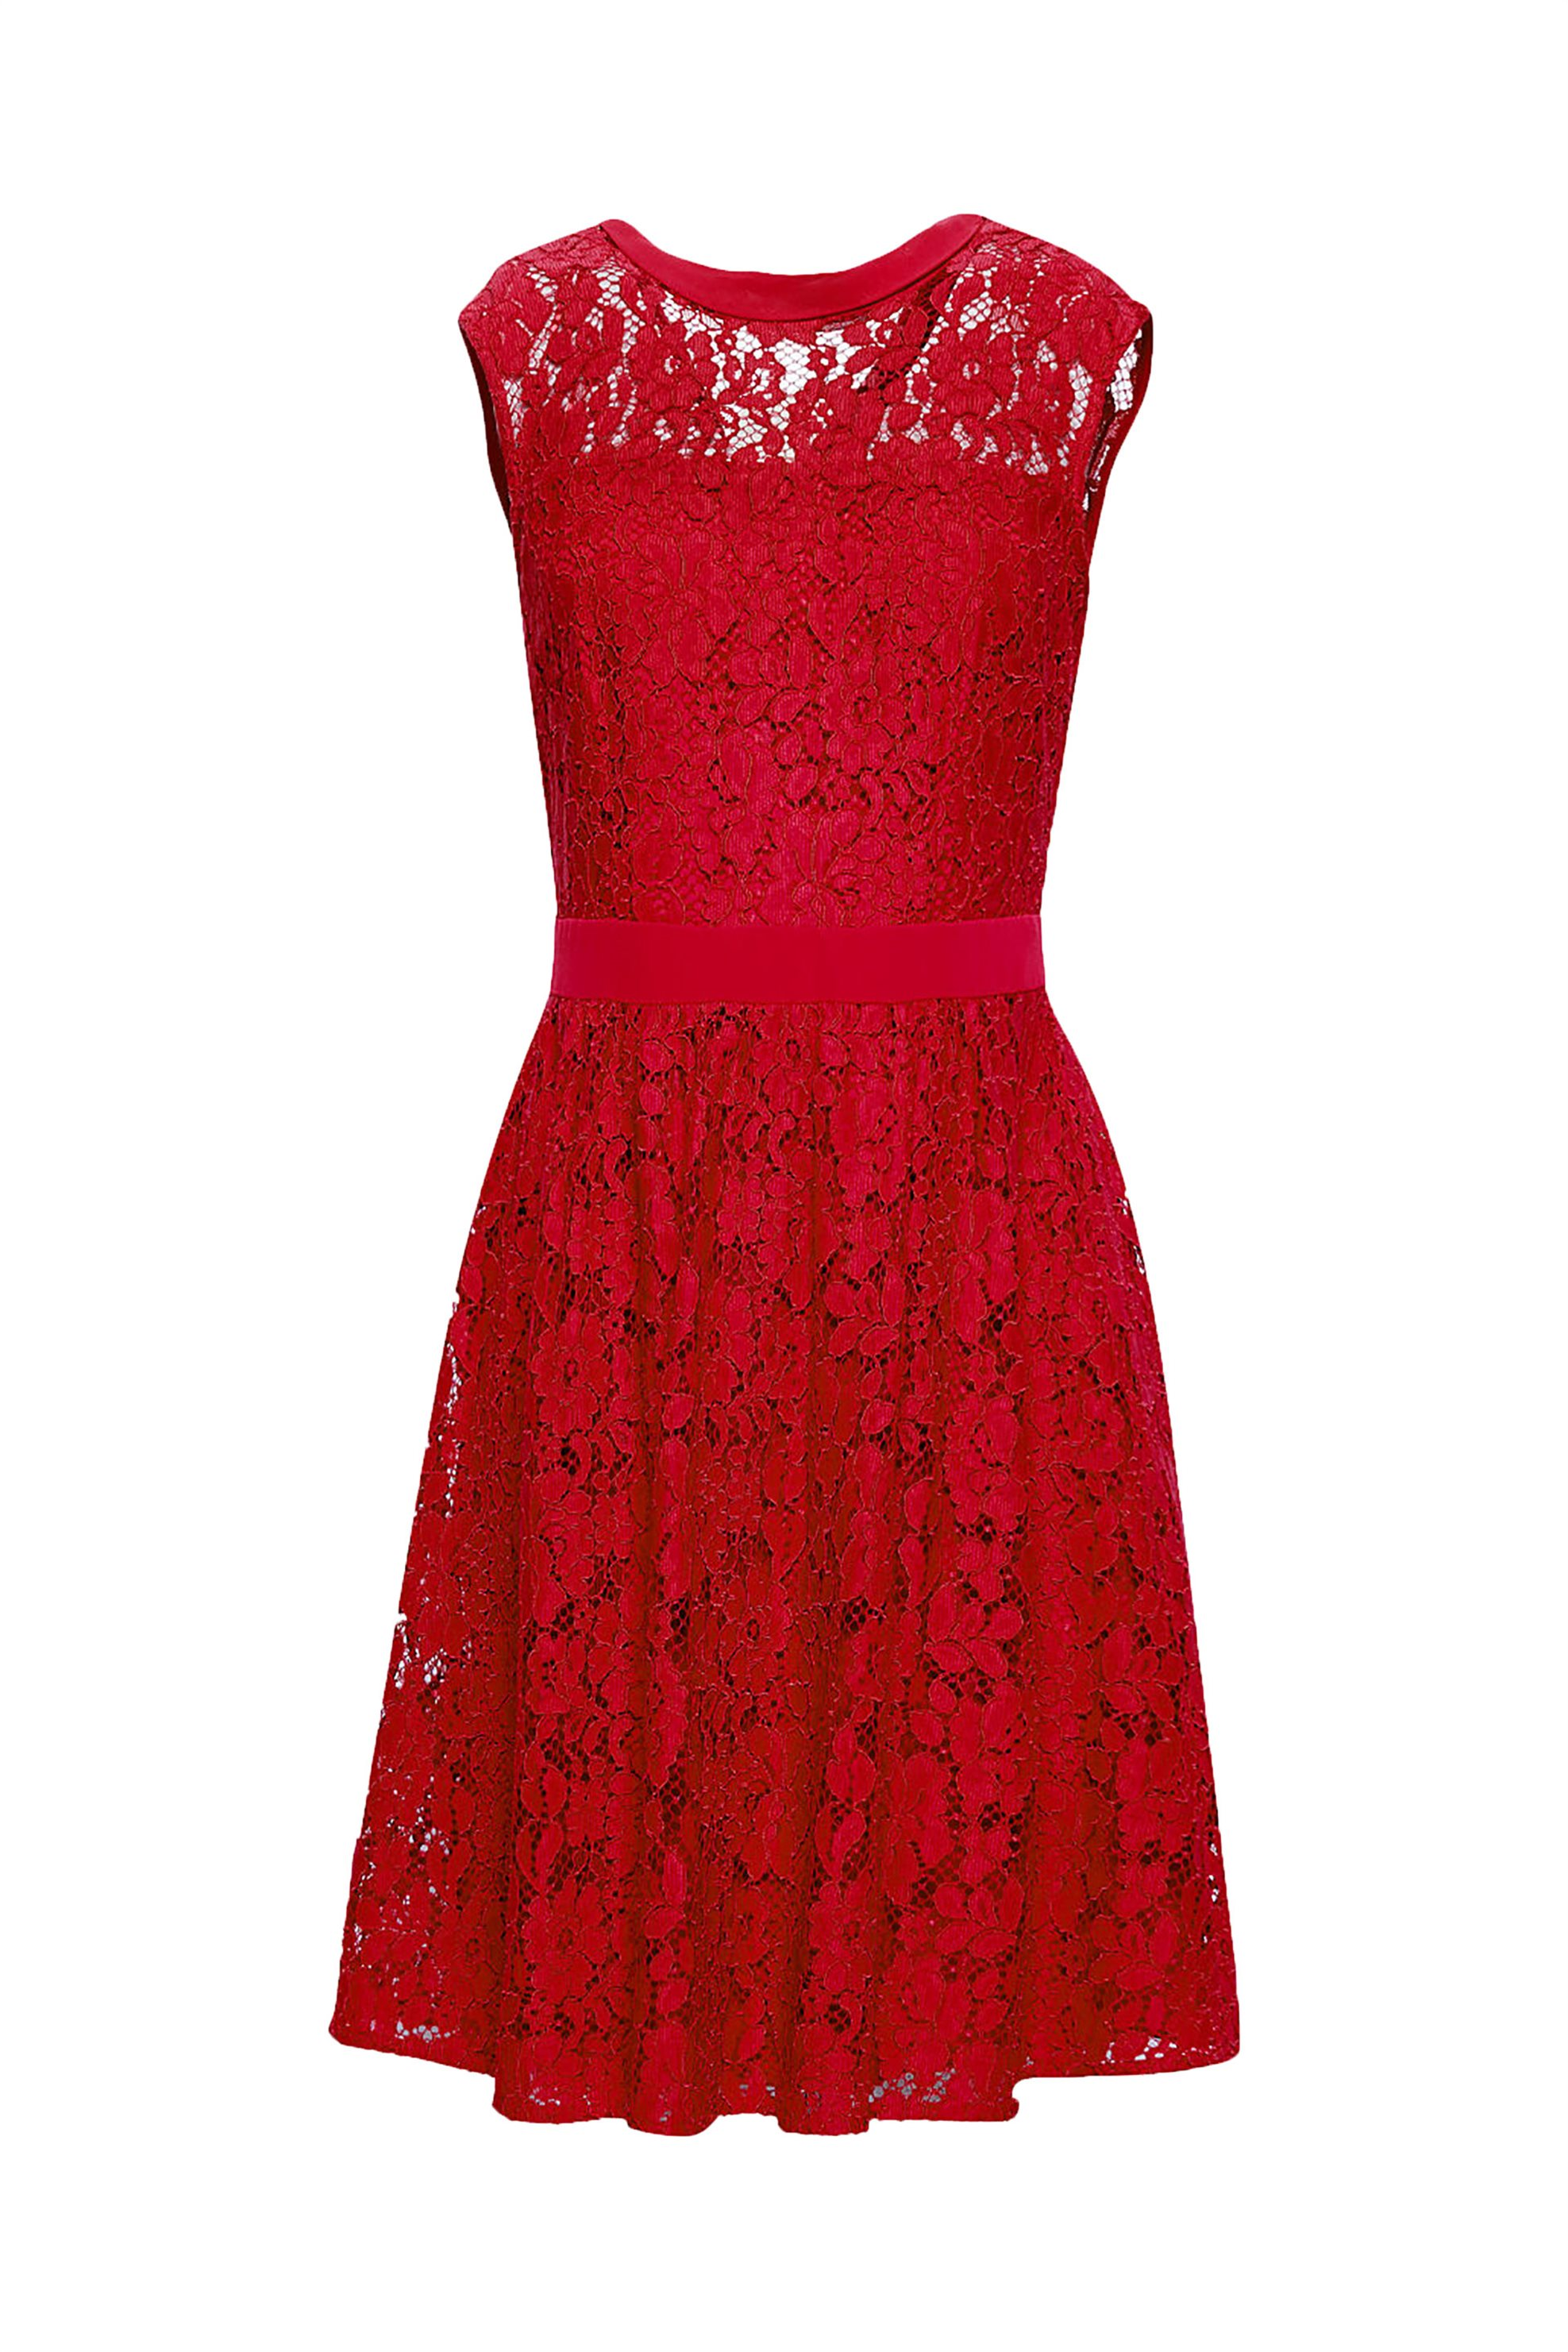 Esprit γυναικείο φόρεμα αμάνικο δαντέλα - 088EO1E016 - Κόκκινο γυναικα   ρουχα   φορέματα   mini φορέματα